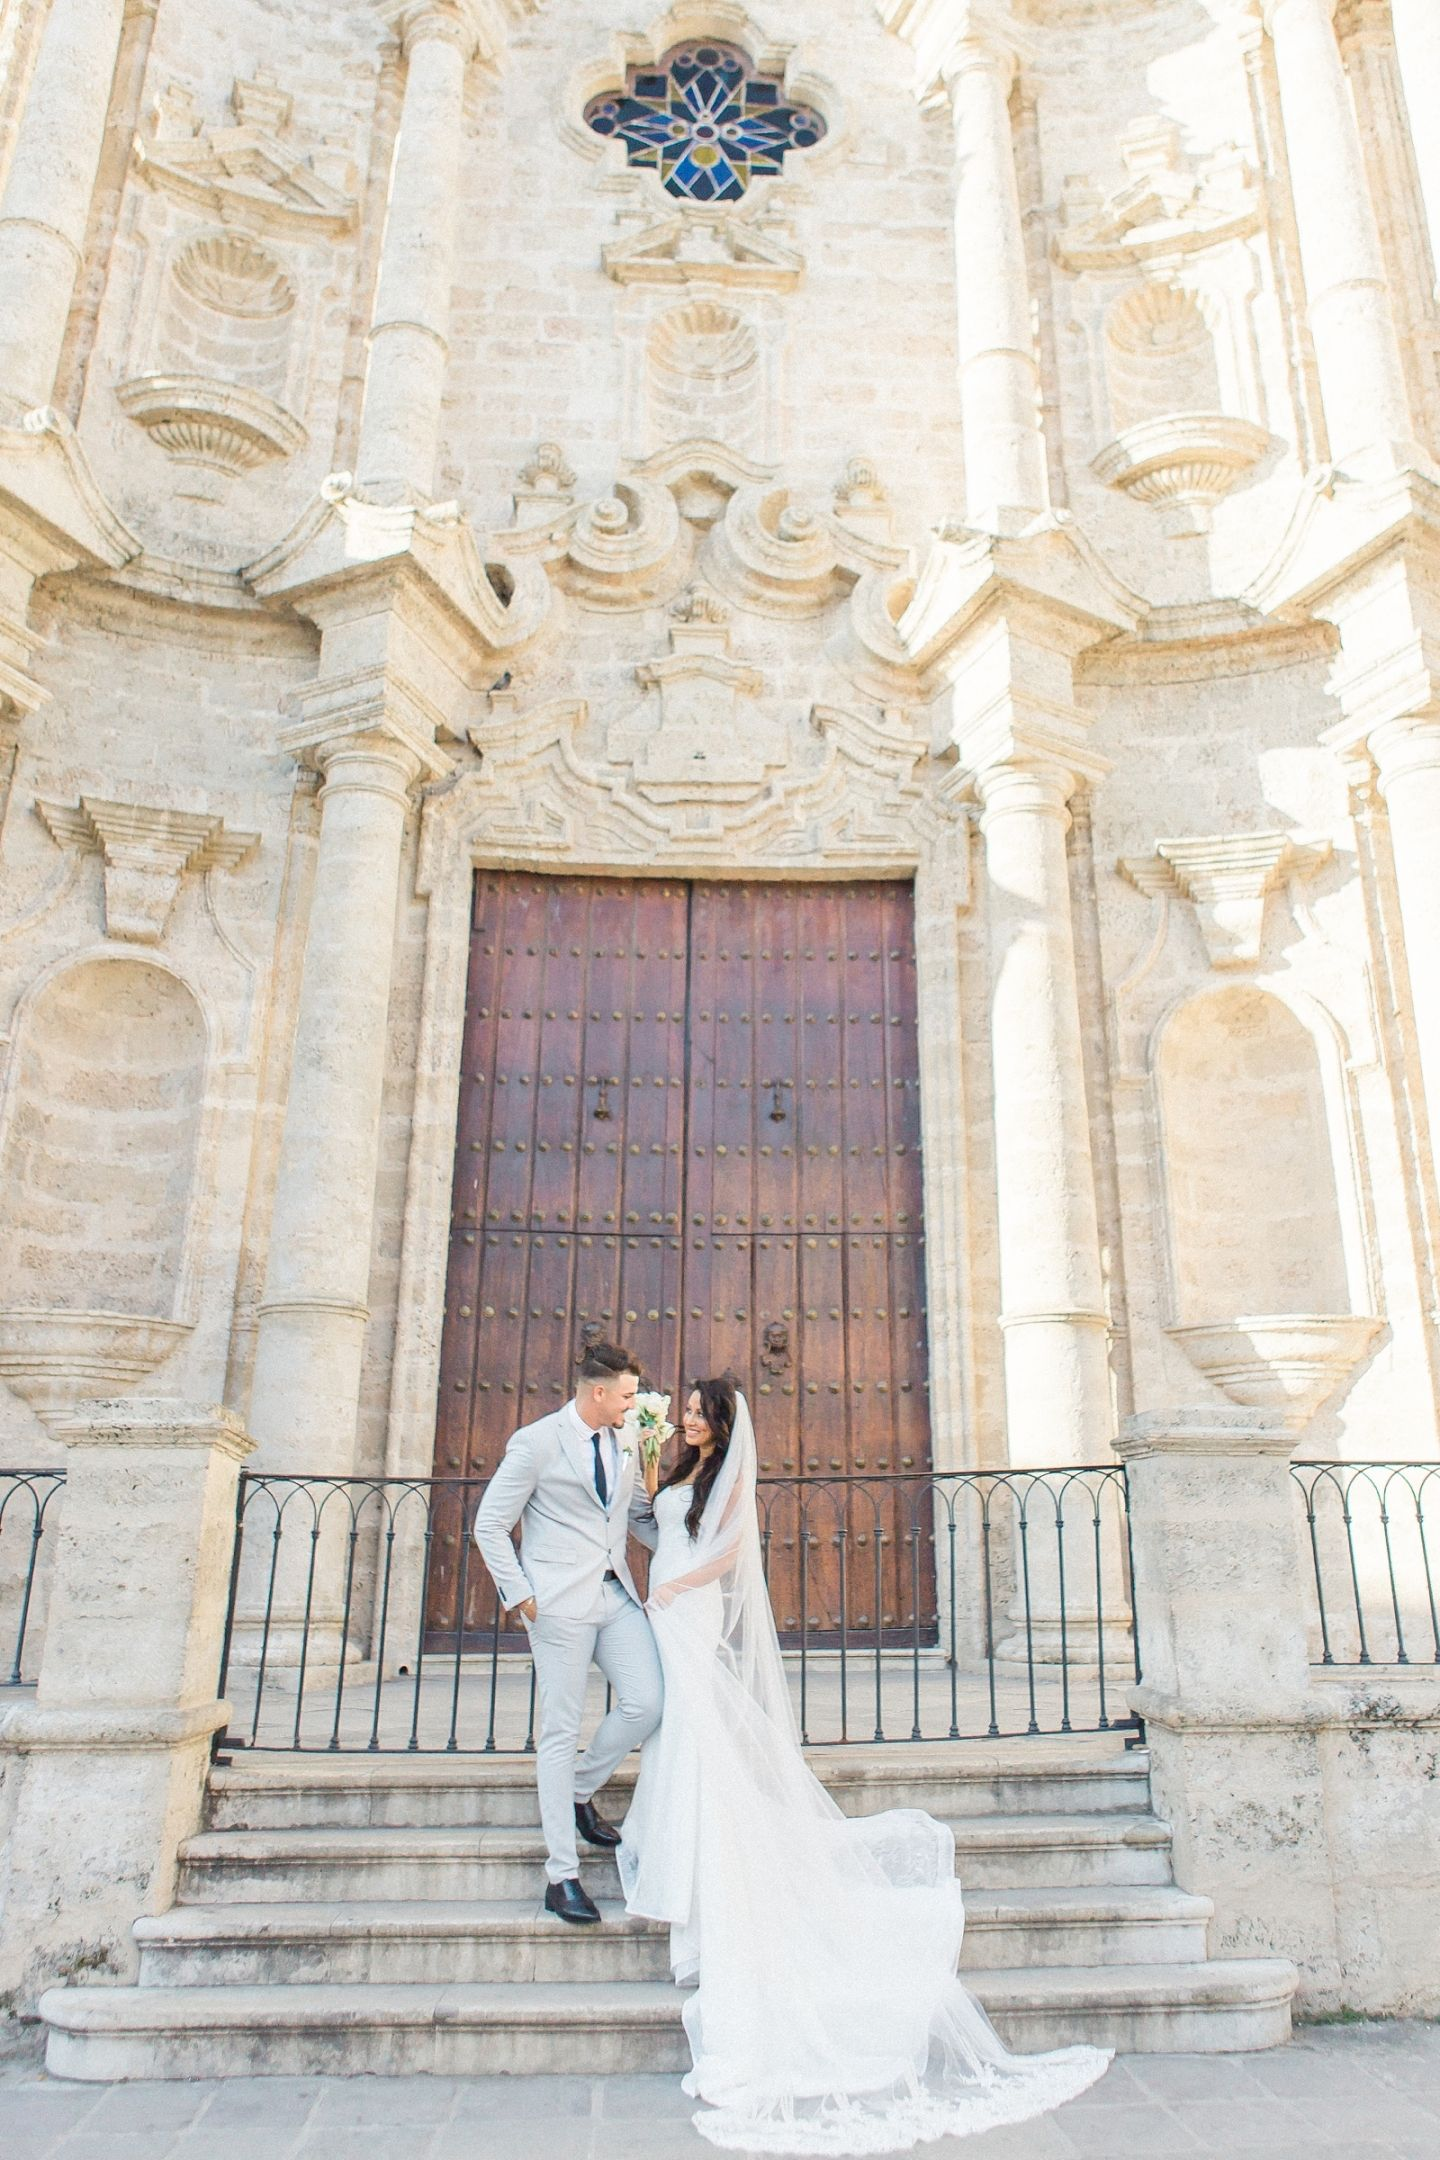 Havana Plaza Cathedral Wedding, Cuba Wedding, getting Married in ...